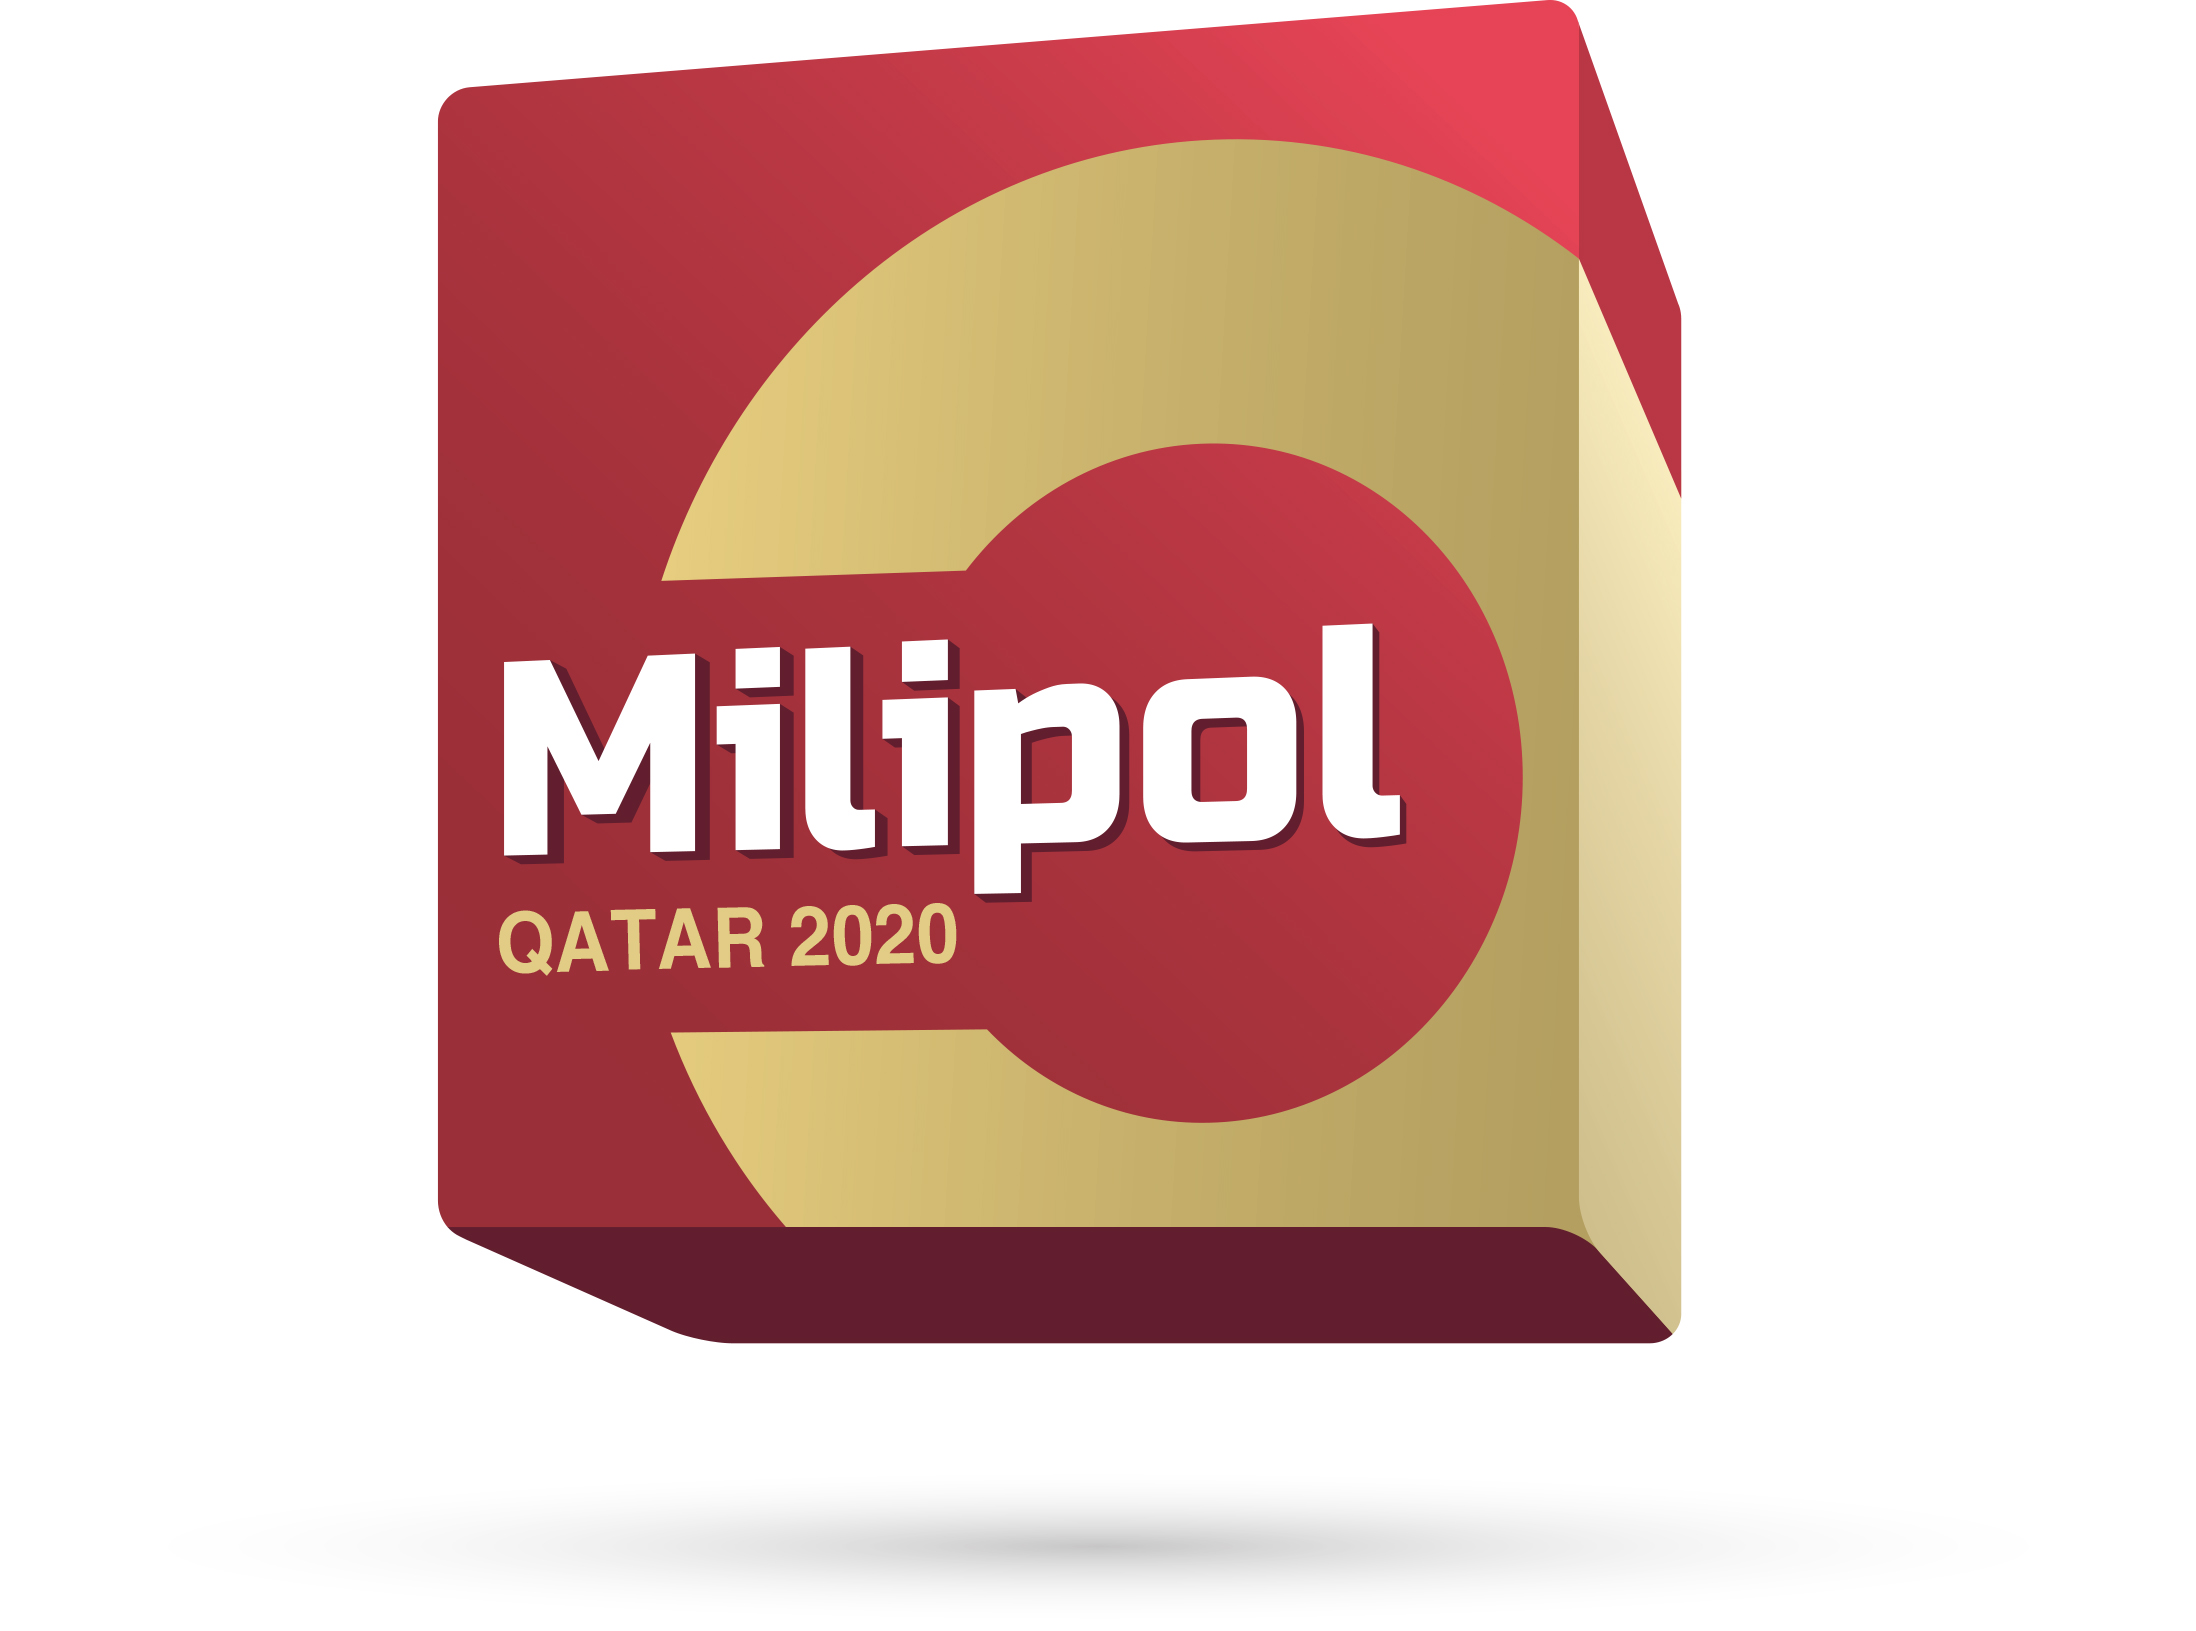 Qatar 2020